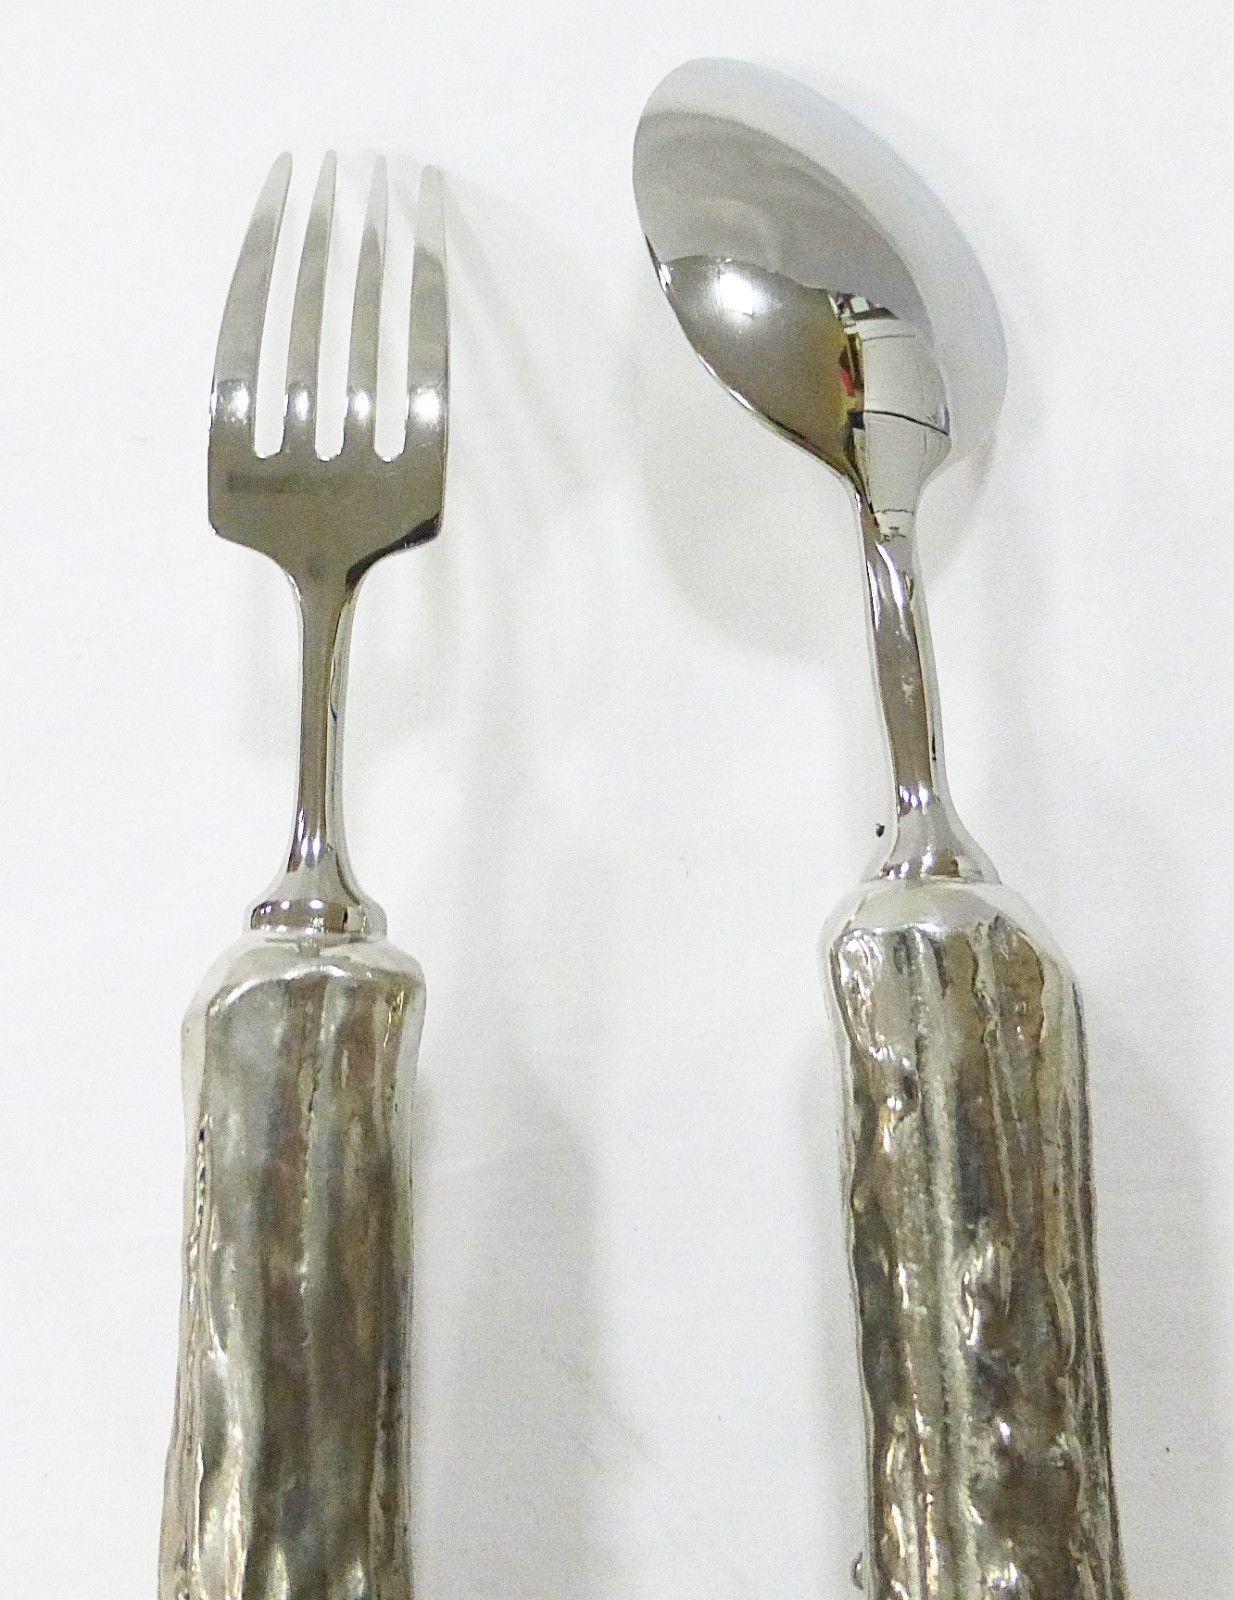 Vagabond House pewter antler handle flatware spoon and fork